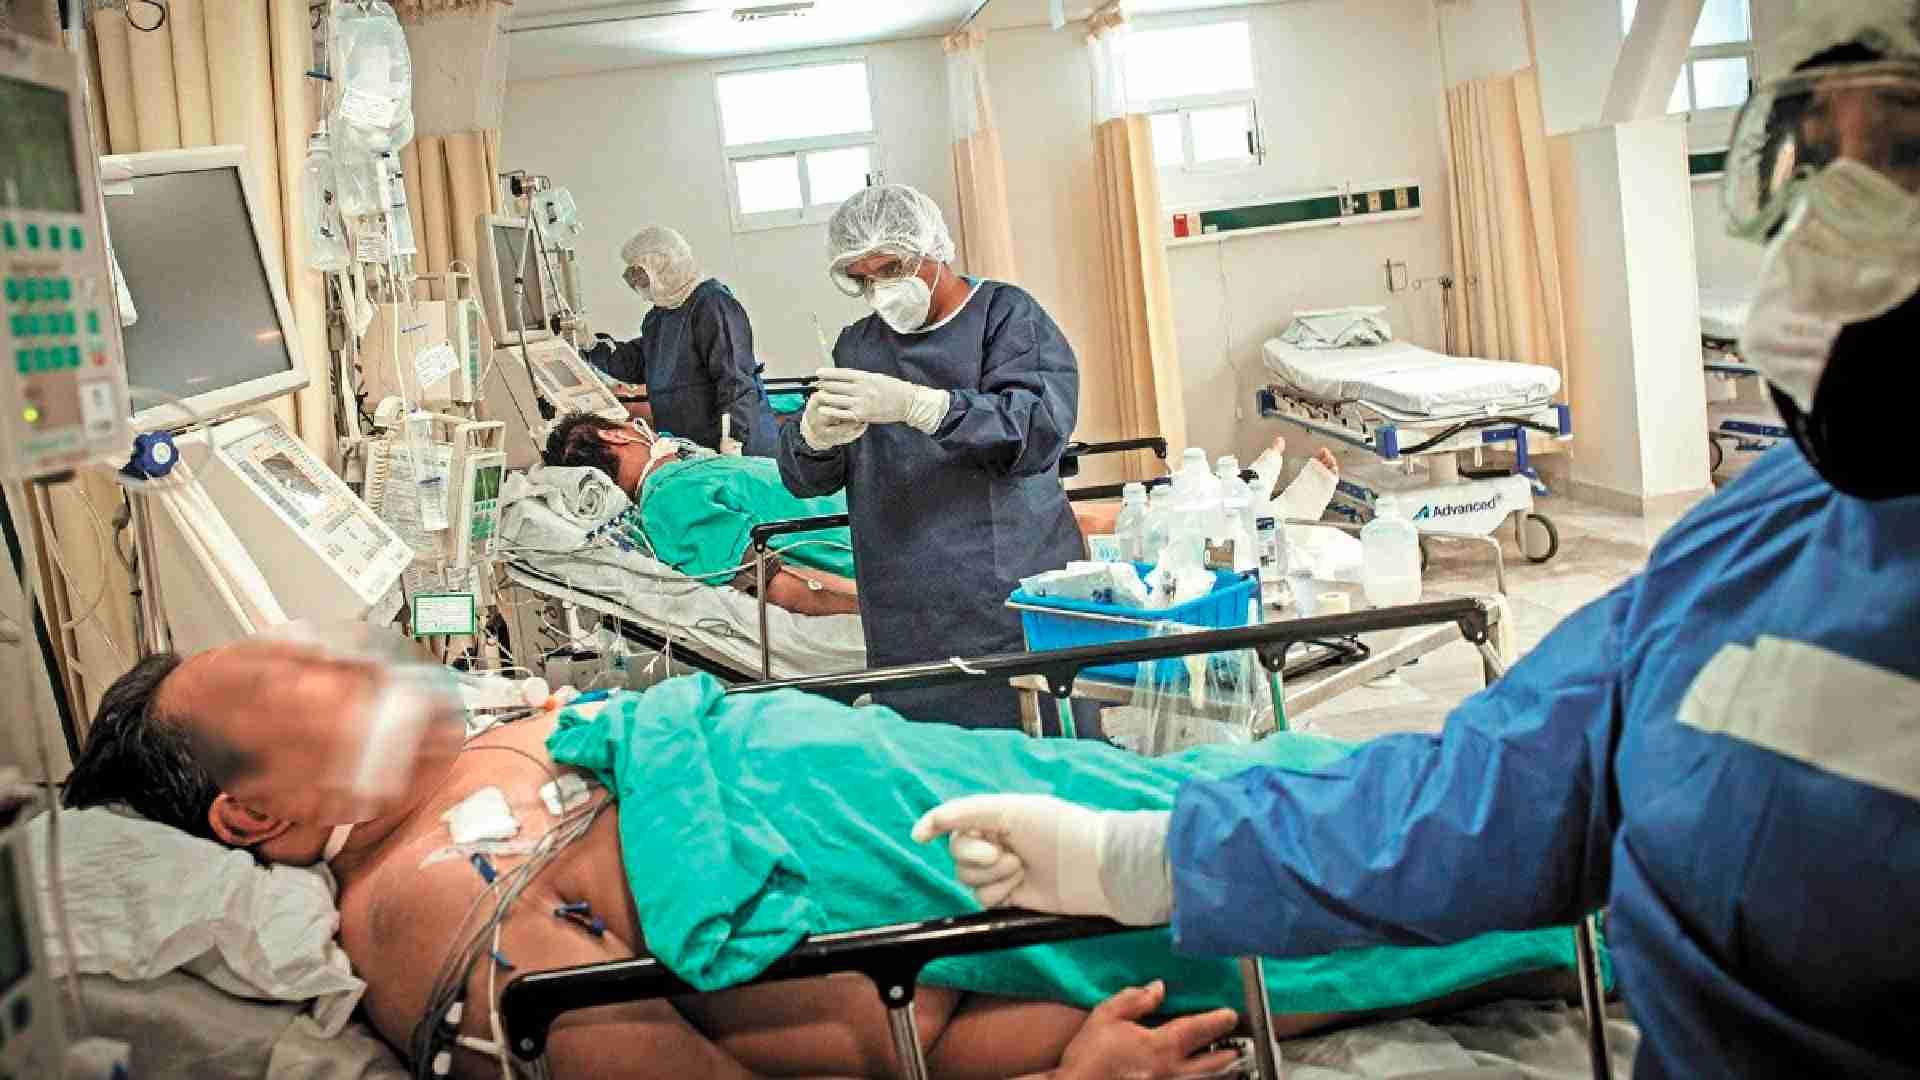 Covid-19-Coronavirus-Tlaxcala-ocupación-hospitalaria-Camas-Hospitales